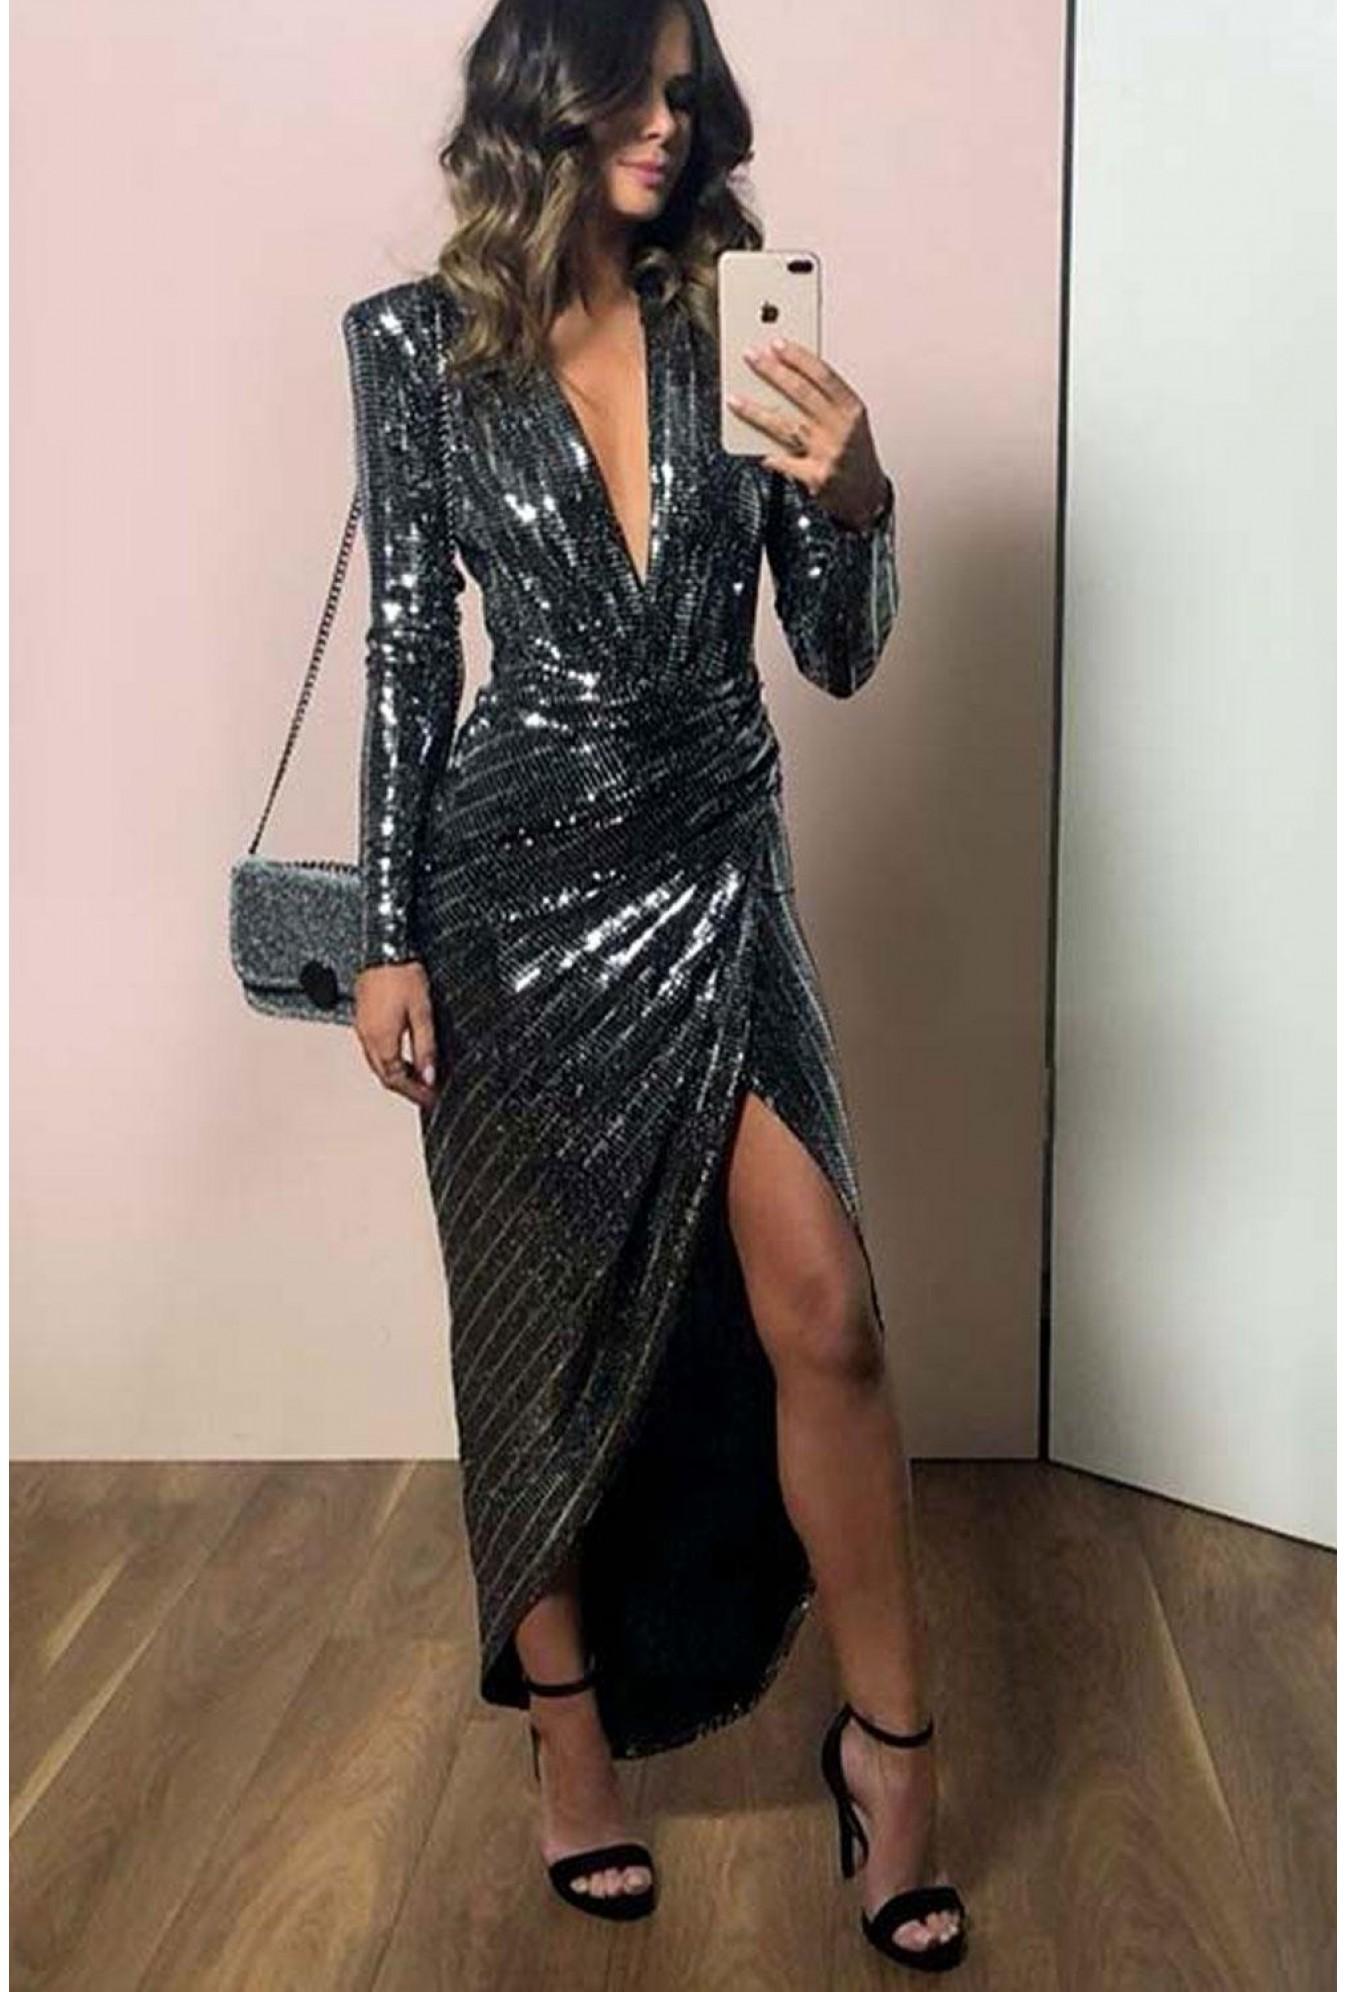 1dbad61454f John Zack Kim Deep V Midi Dress in Silver Sequin   iCLOTHING